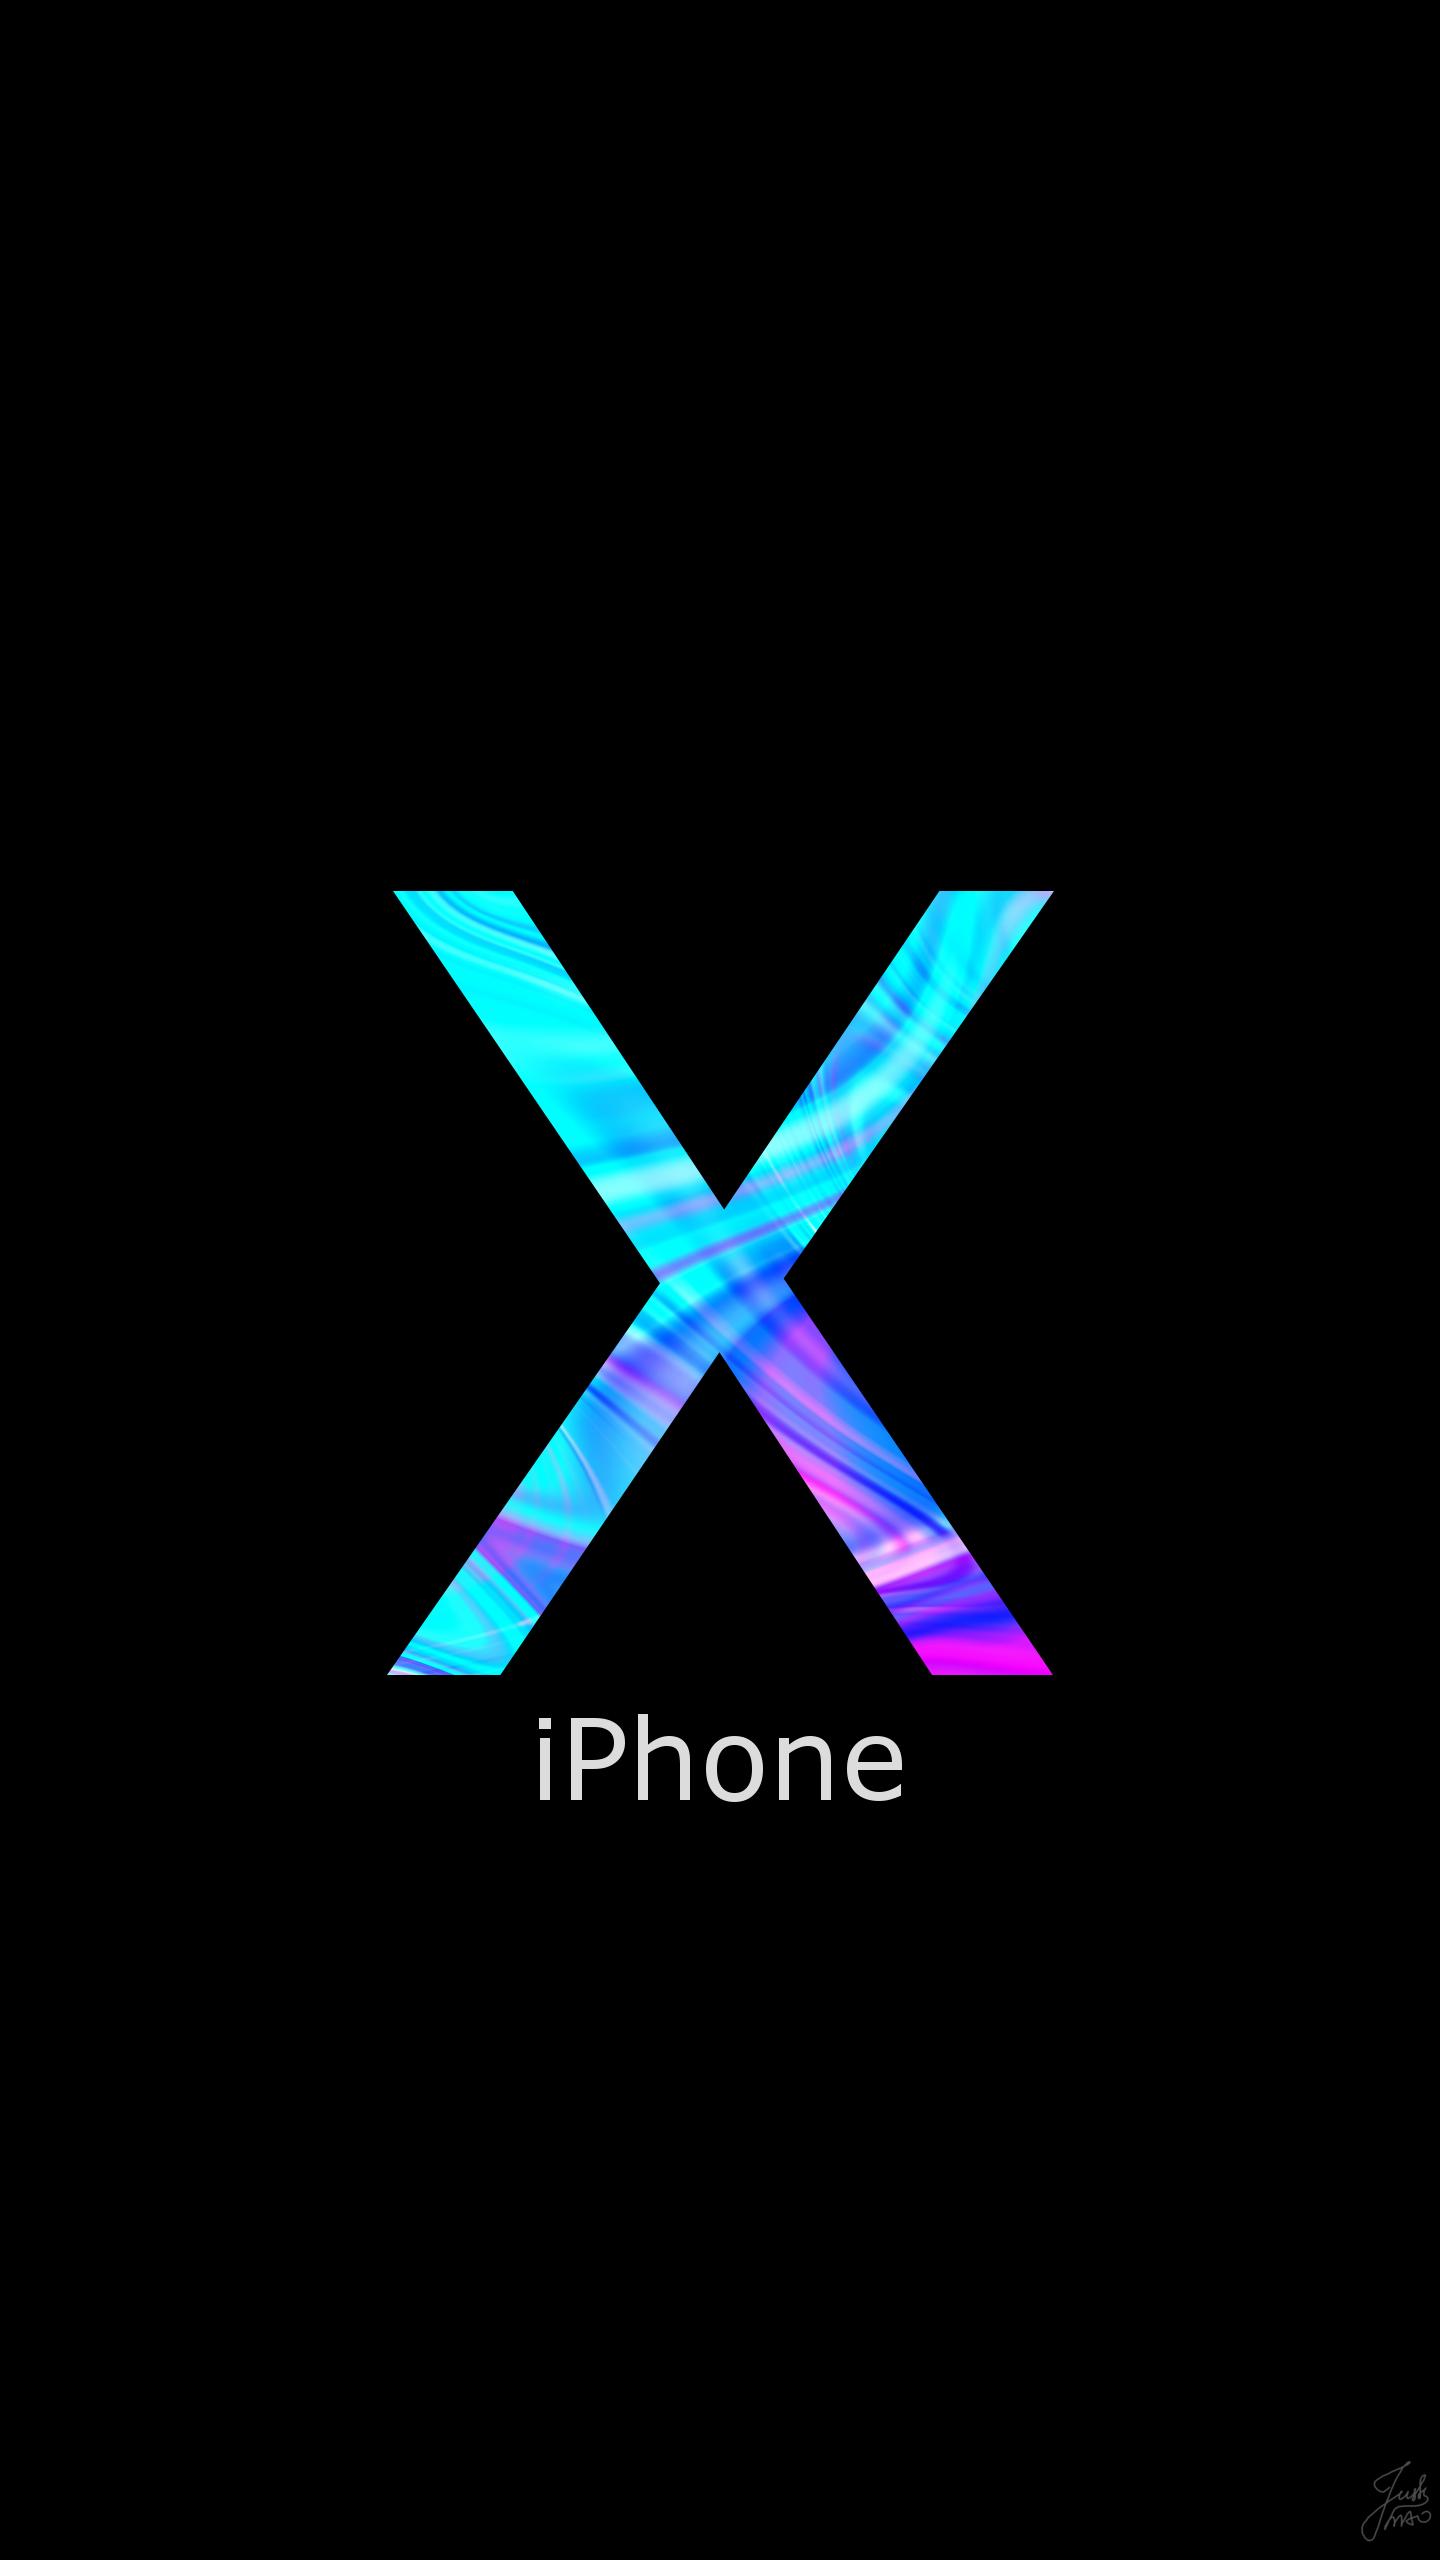 iPhone X, phone wallpaper, background, lock screen